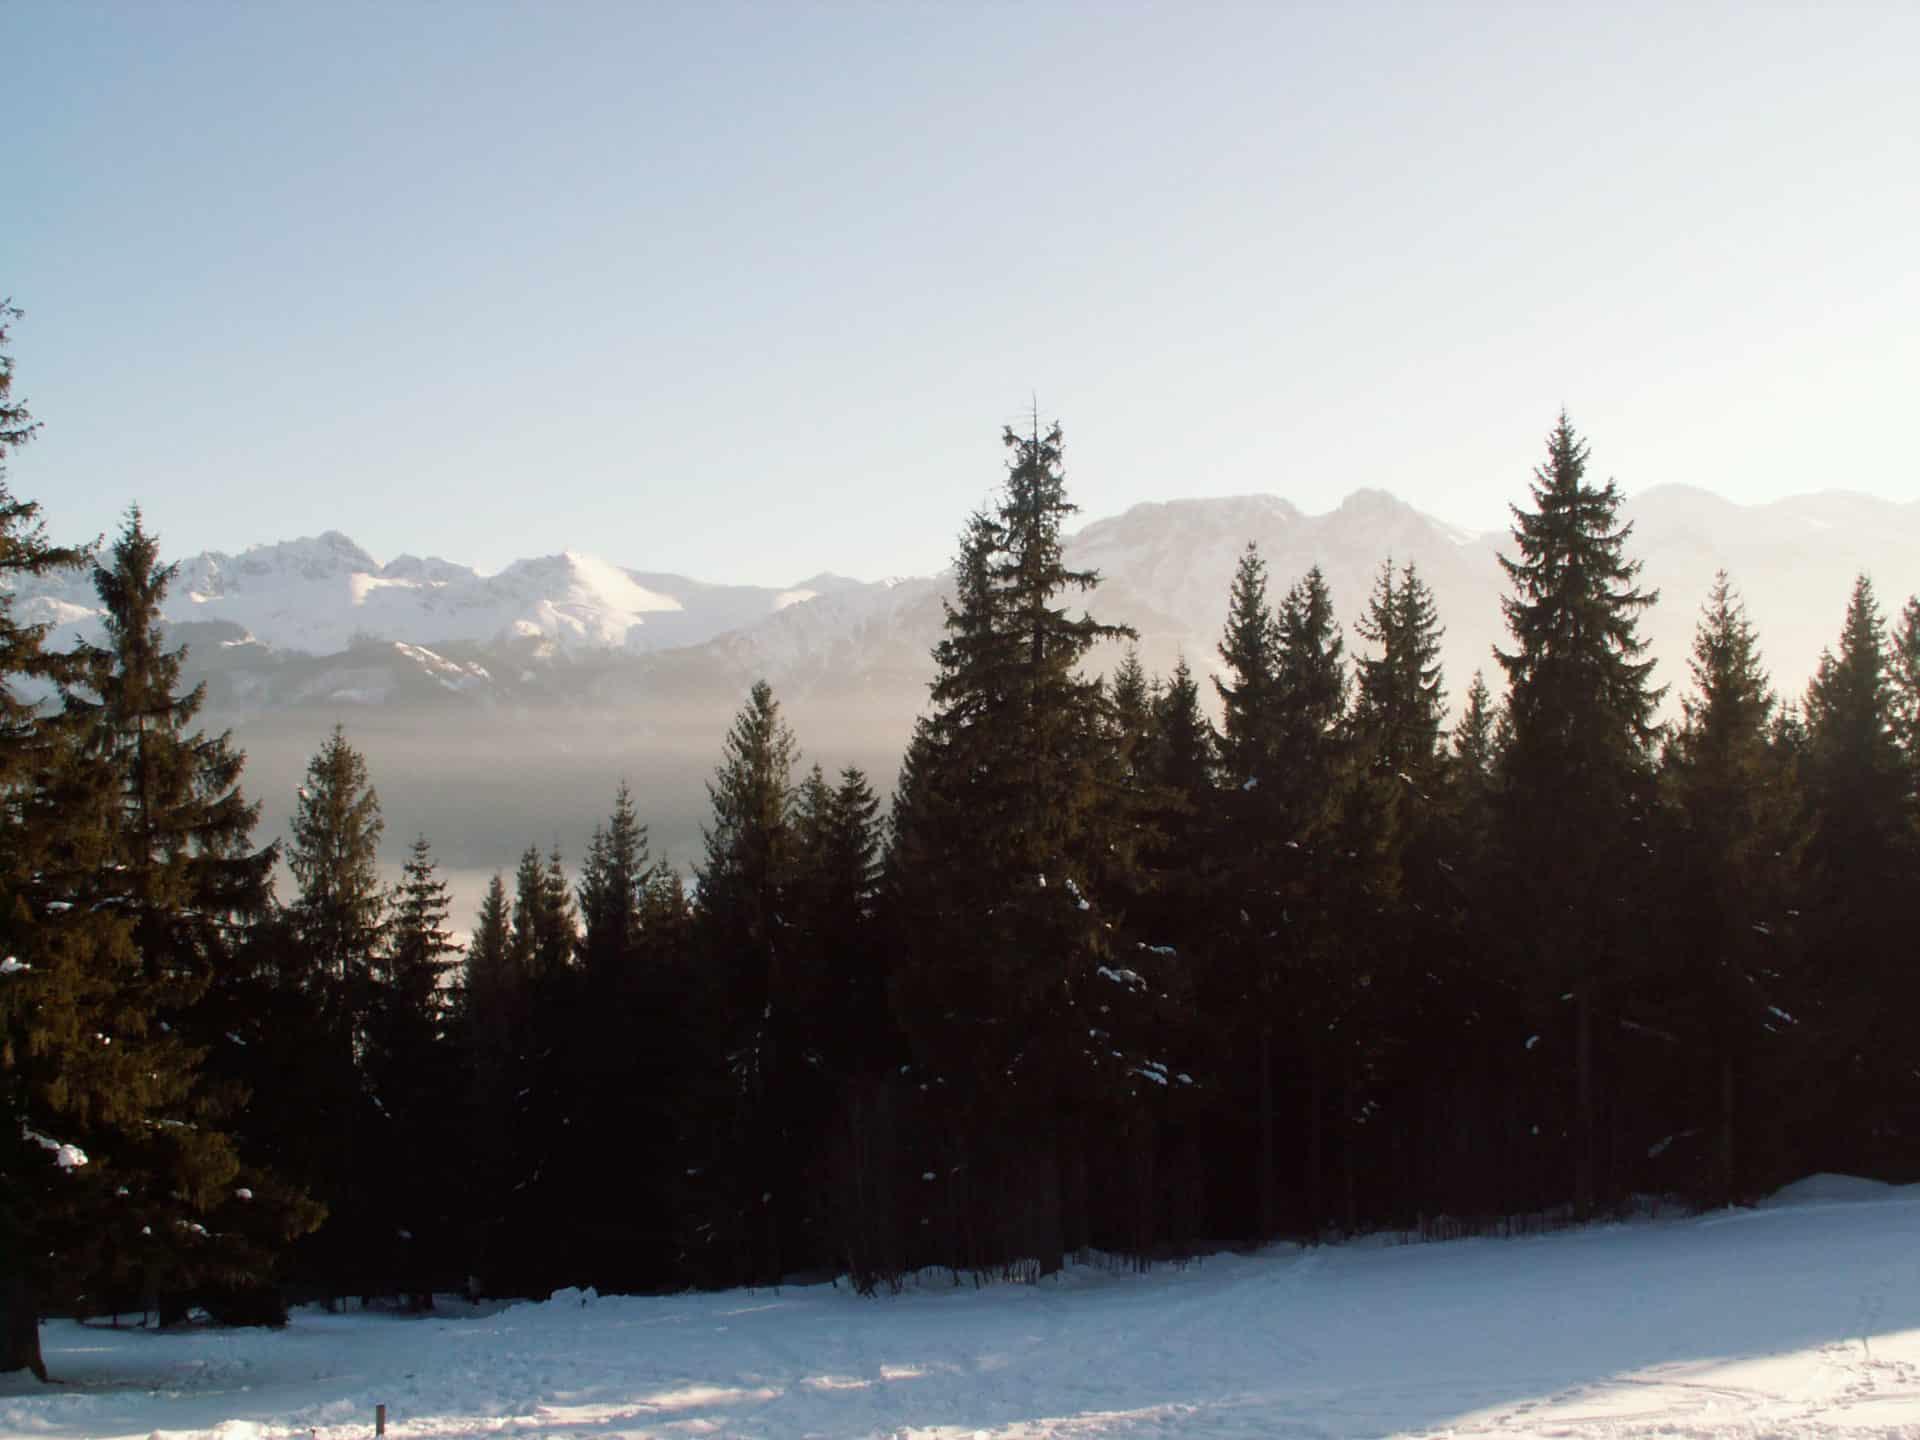 Ski touring in the Tatras in Poland